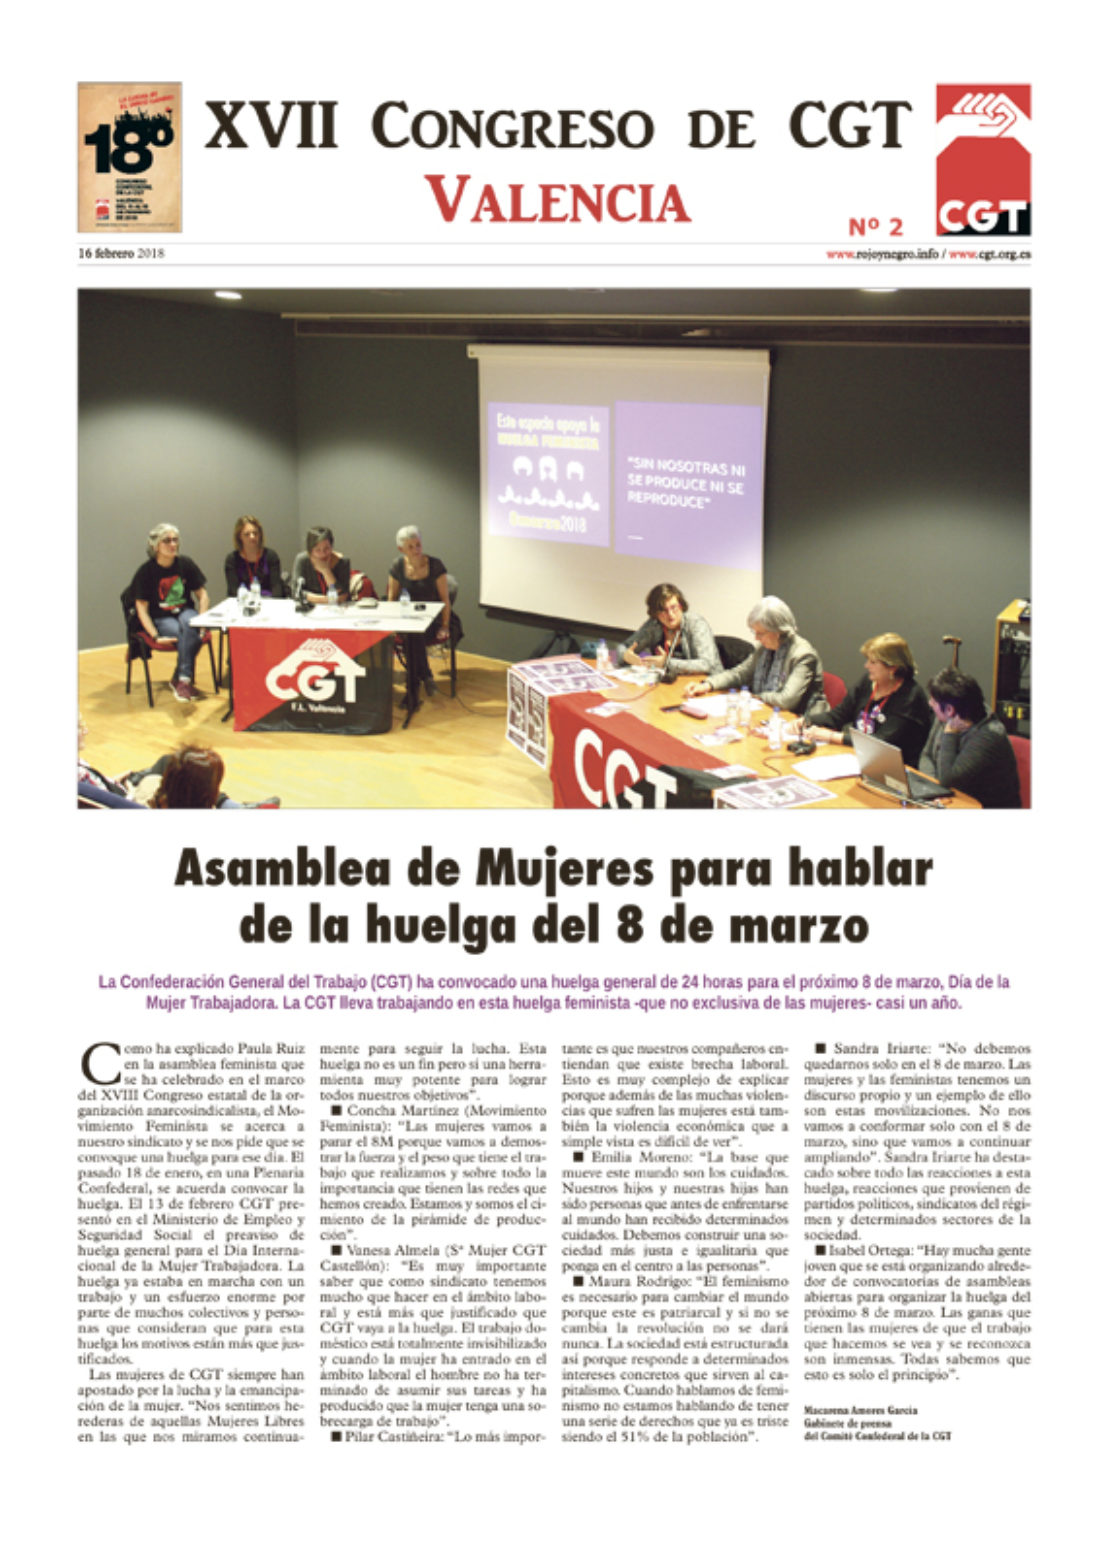 XVIII Congreso de CGT en Valencia. Diario 2